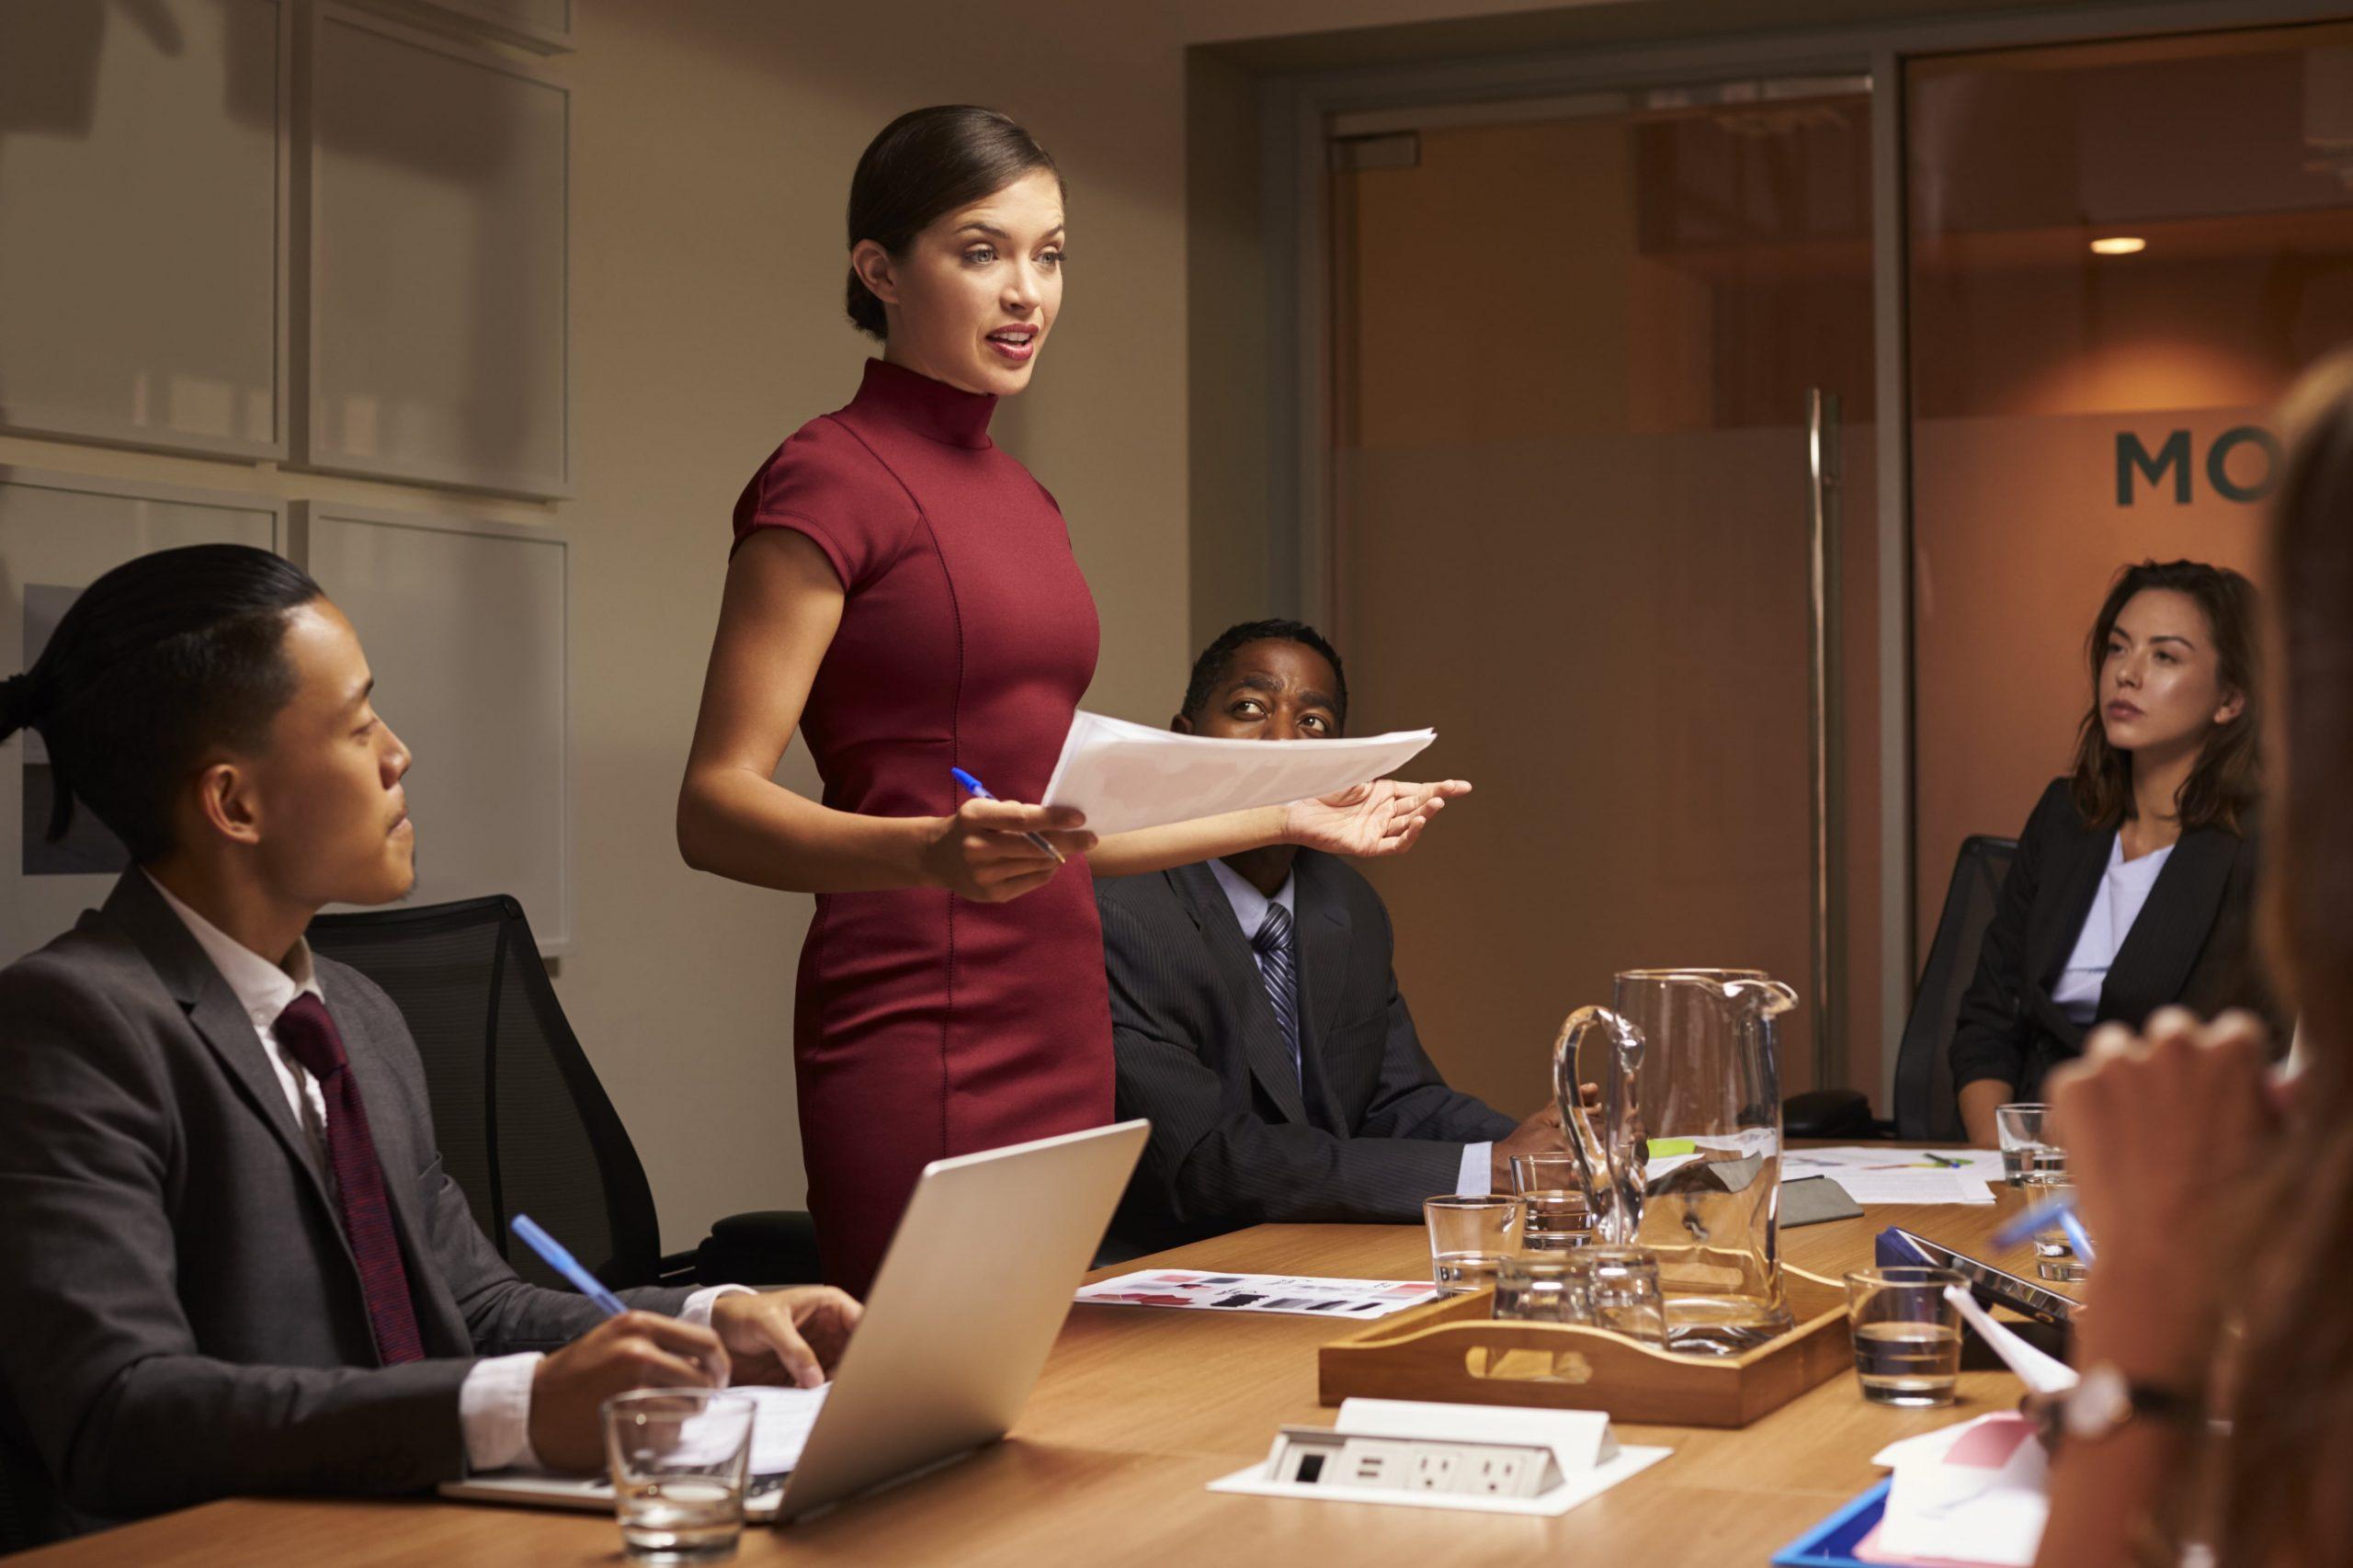 brandminds_2019_woman_leadership_roles